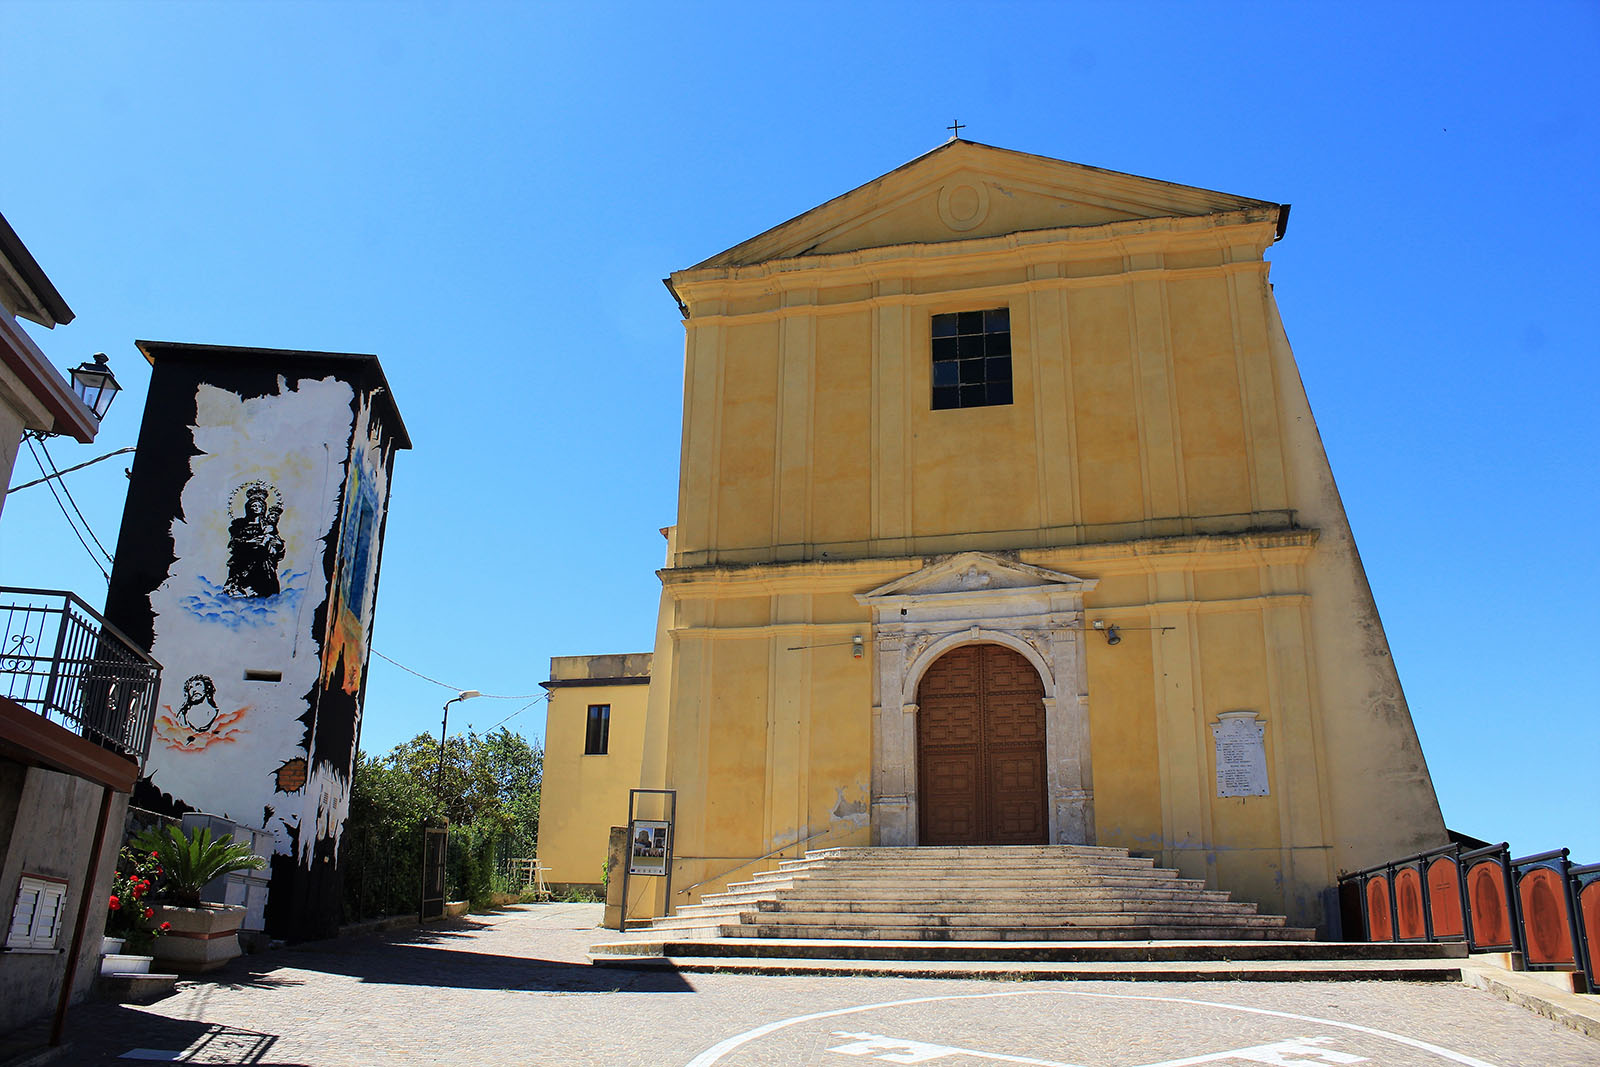 San Pietro Magisano